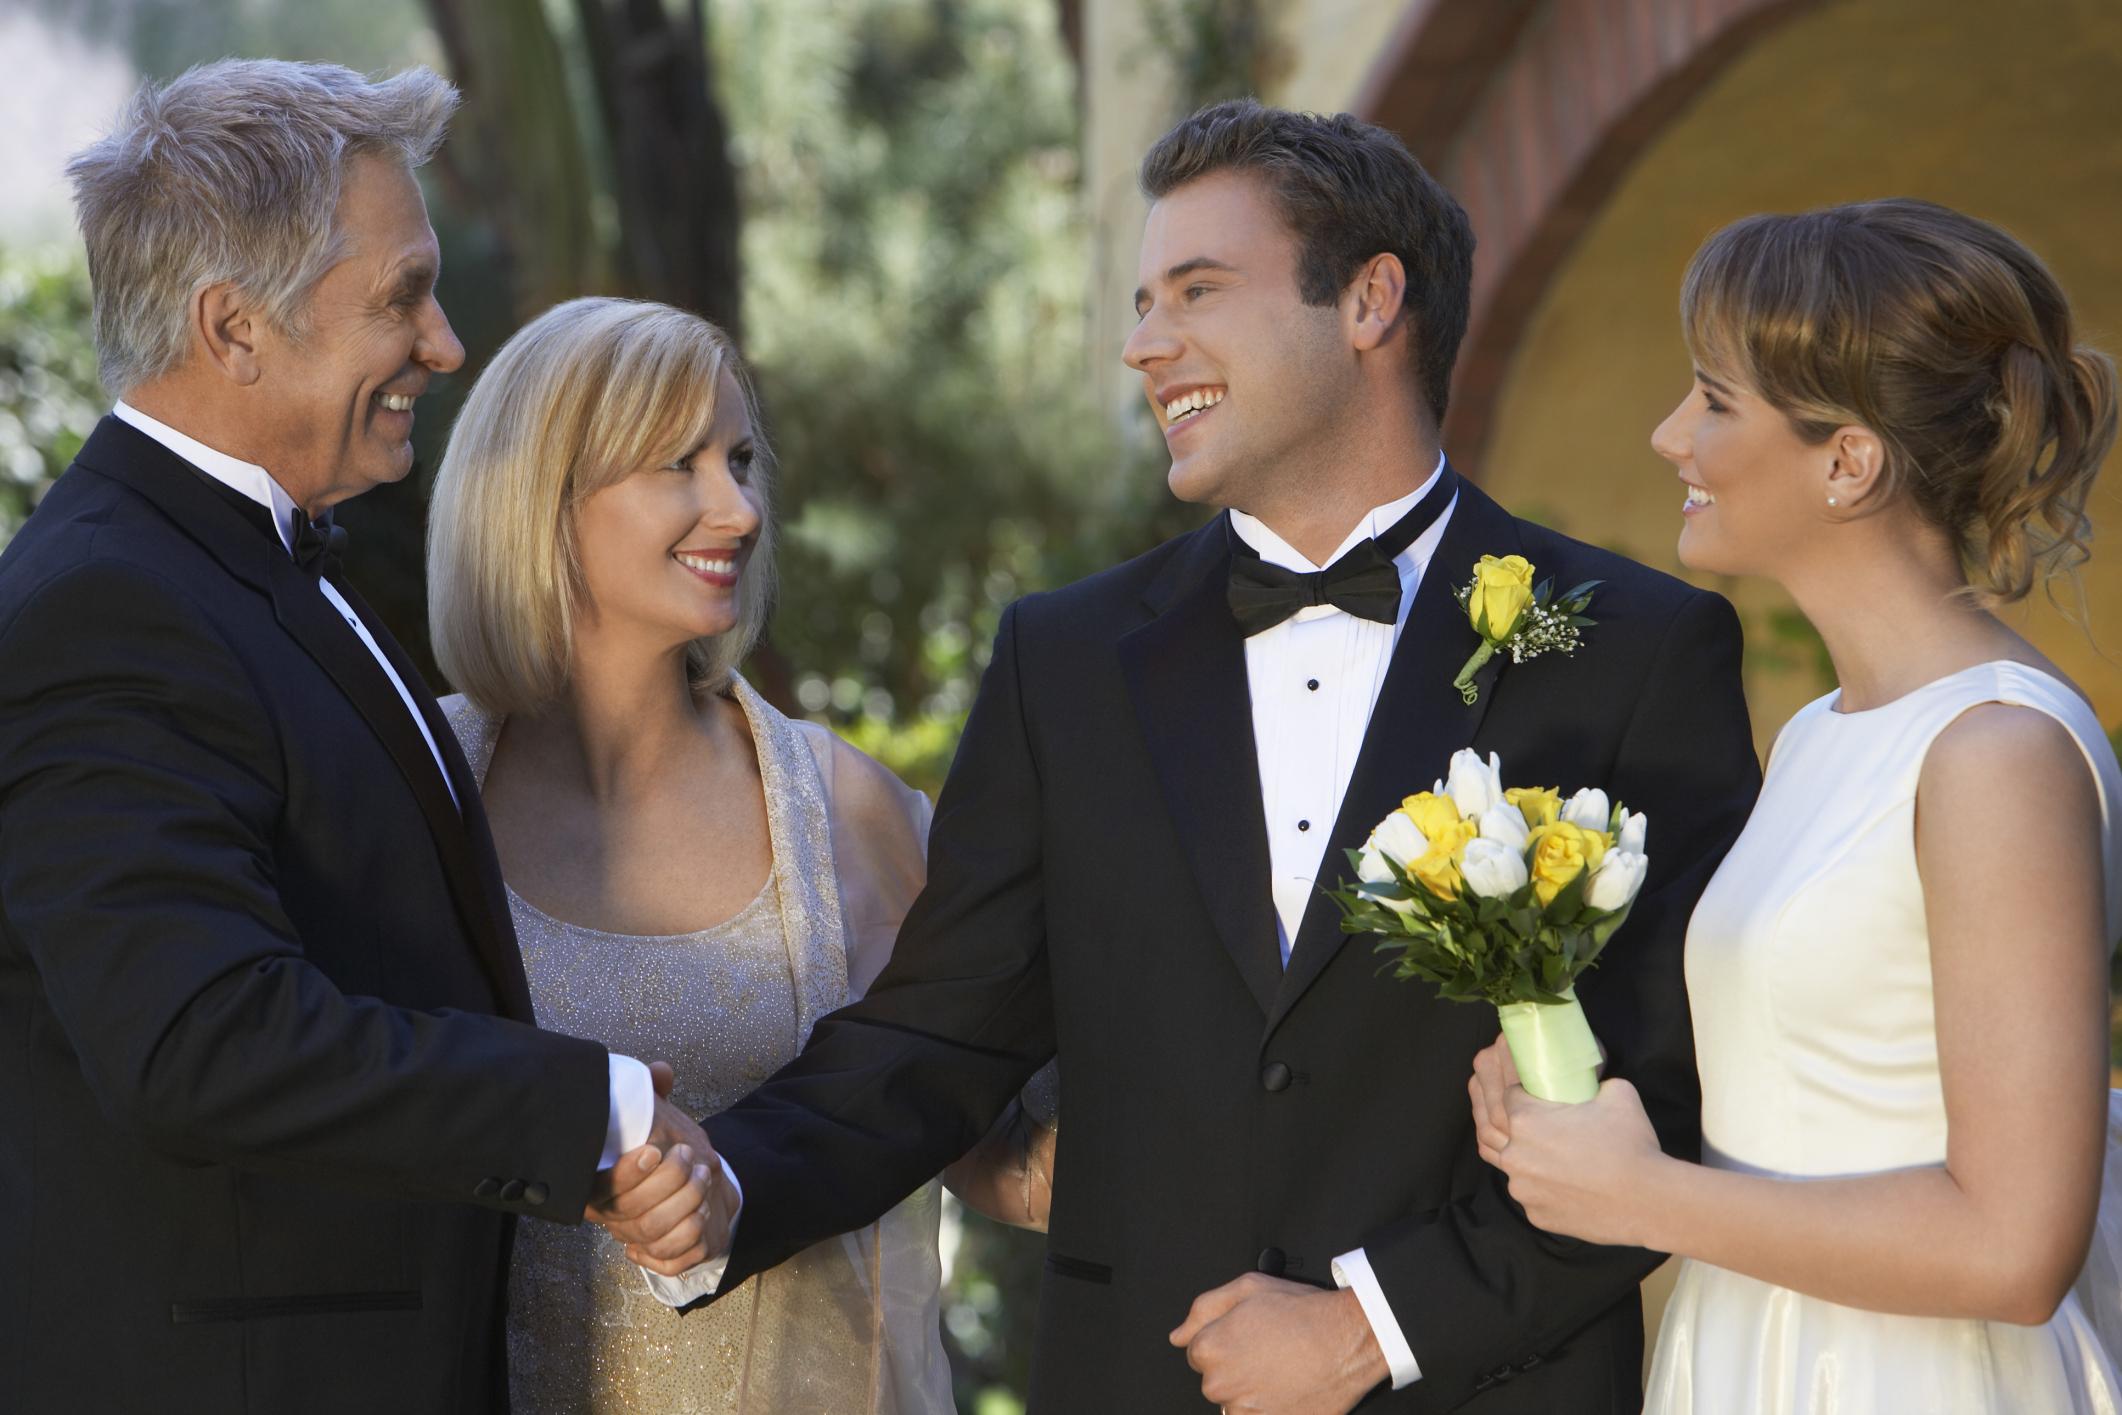 Wedding Etiquette For Groom S Parents: Wedding Tuxedo